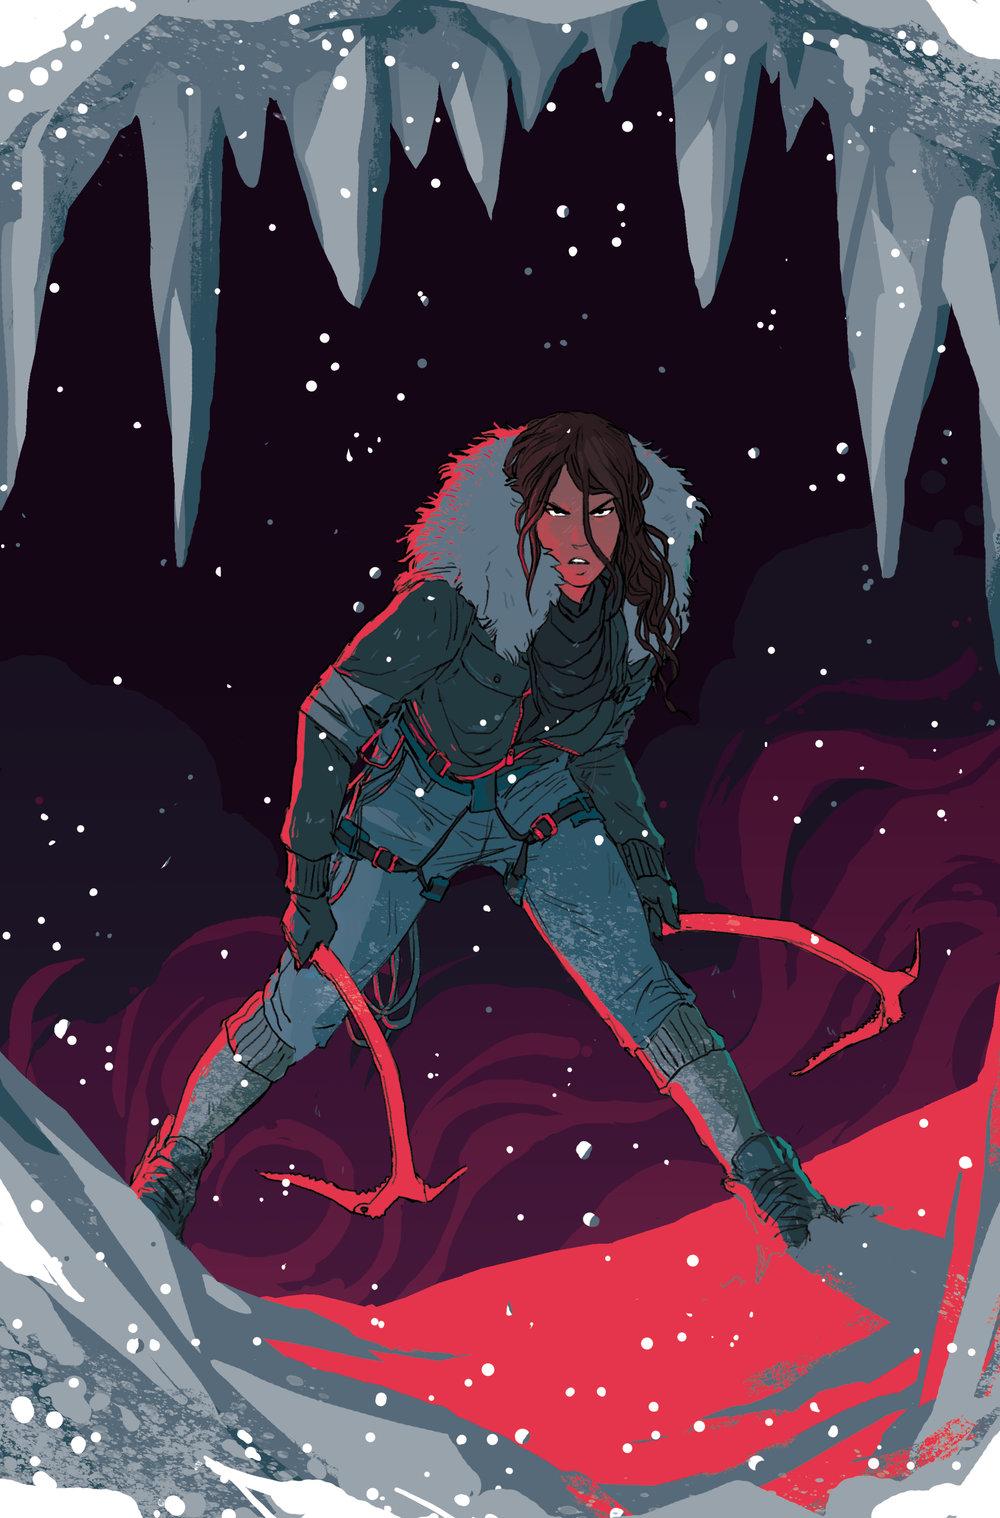 Cover  - Tomb Raider: Inferno  #4 - Dark Horse Comics